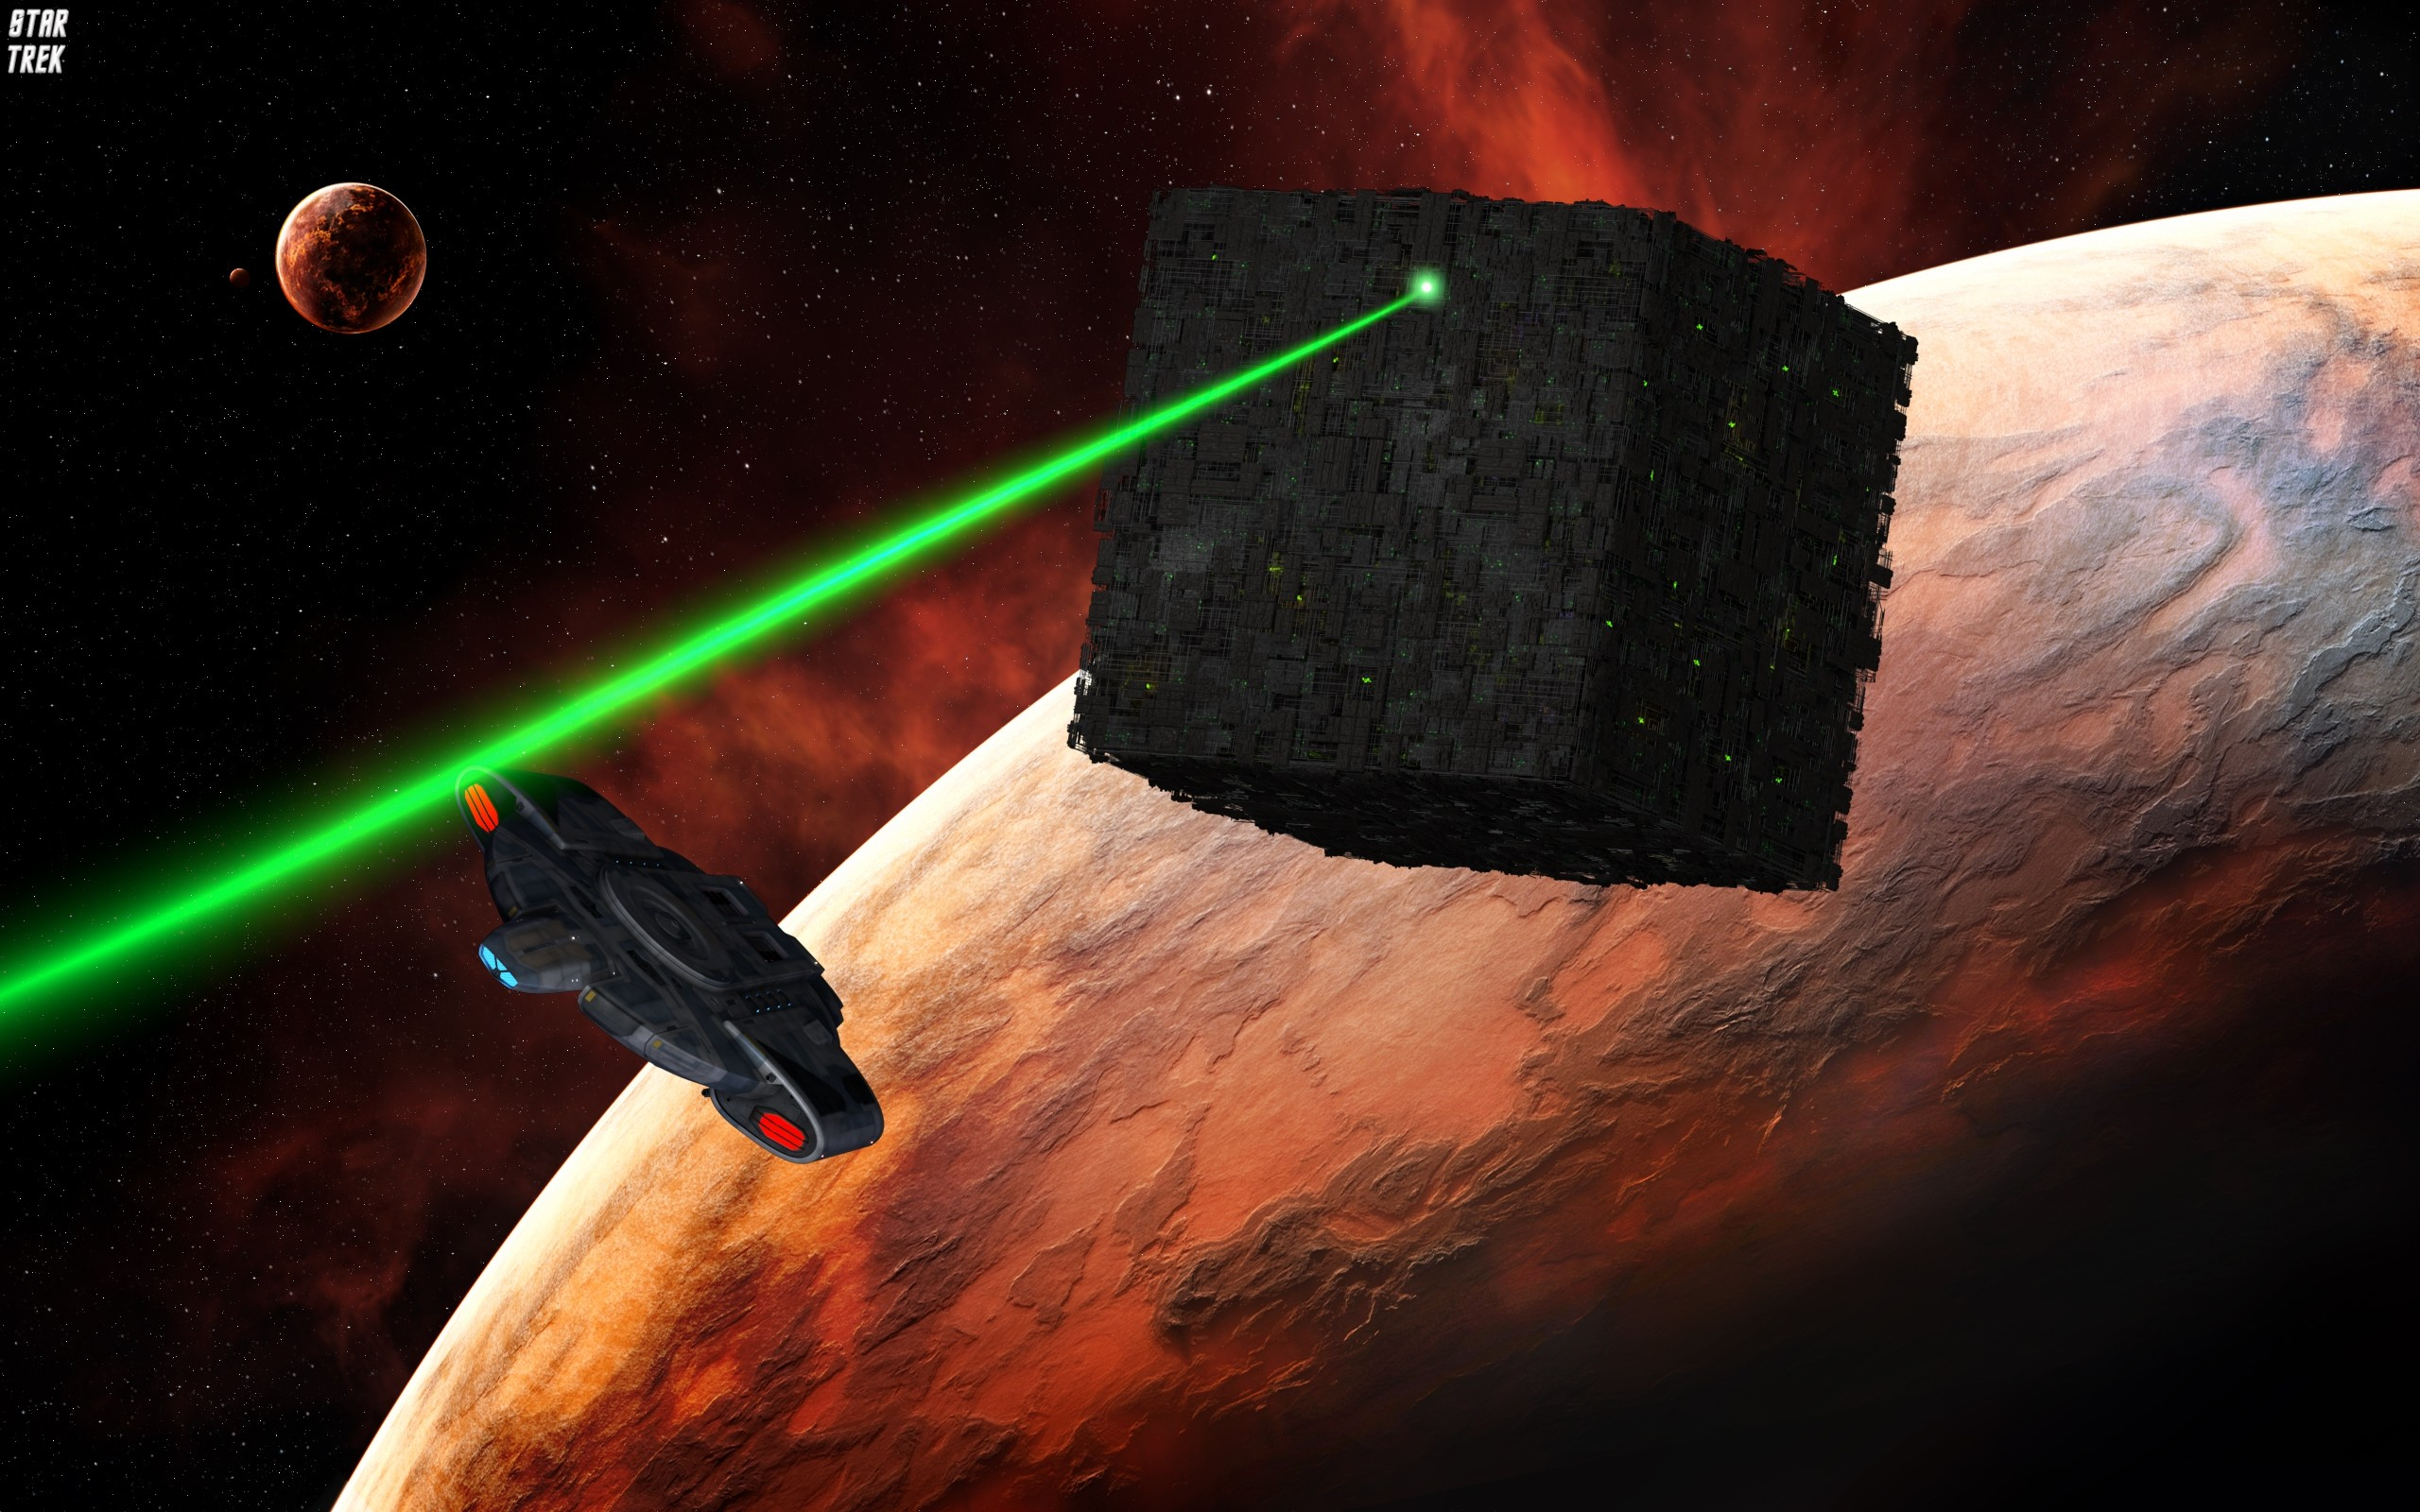 Download Free Borg Star Trek Wallpaper.